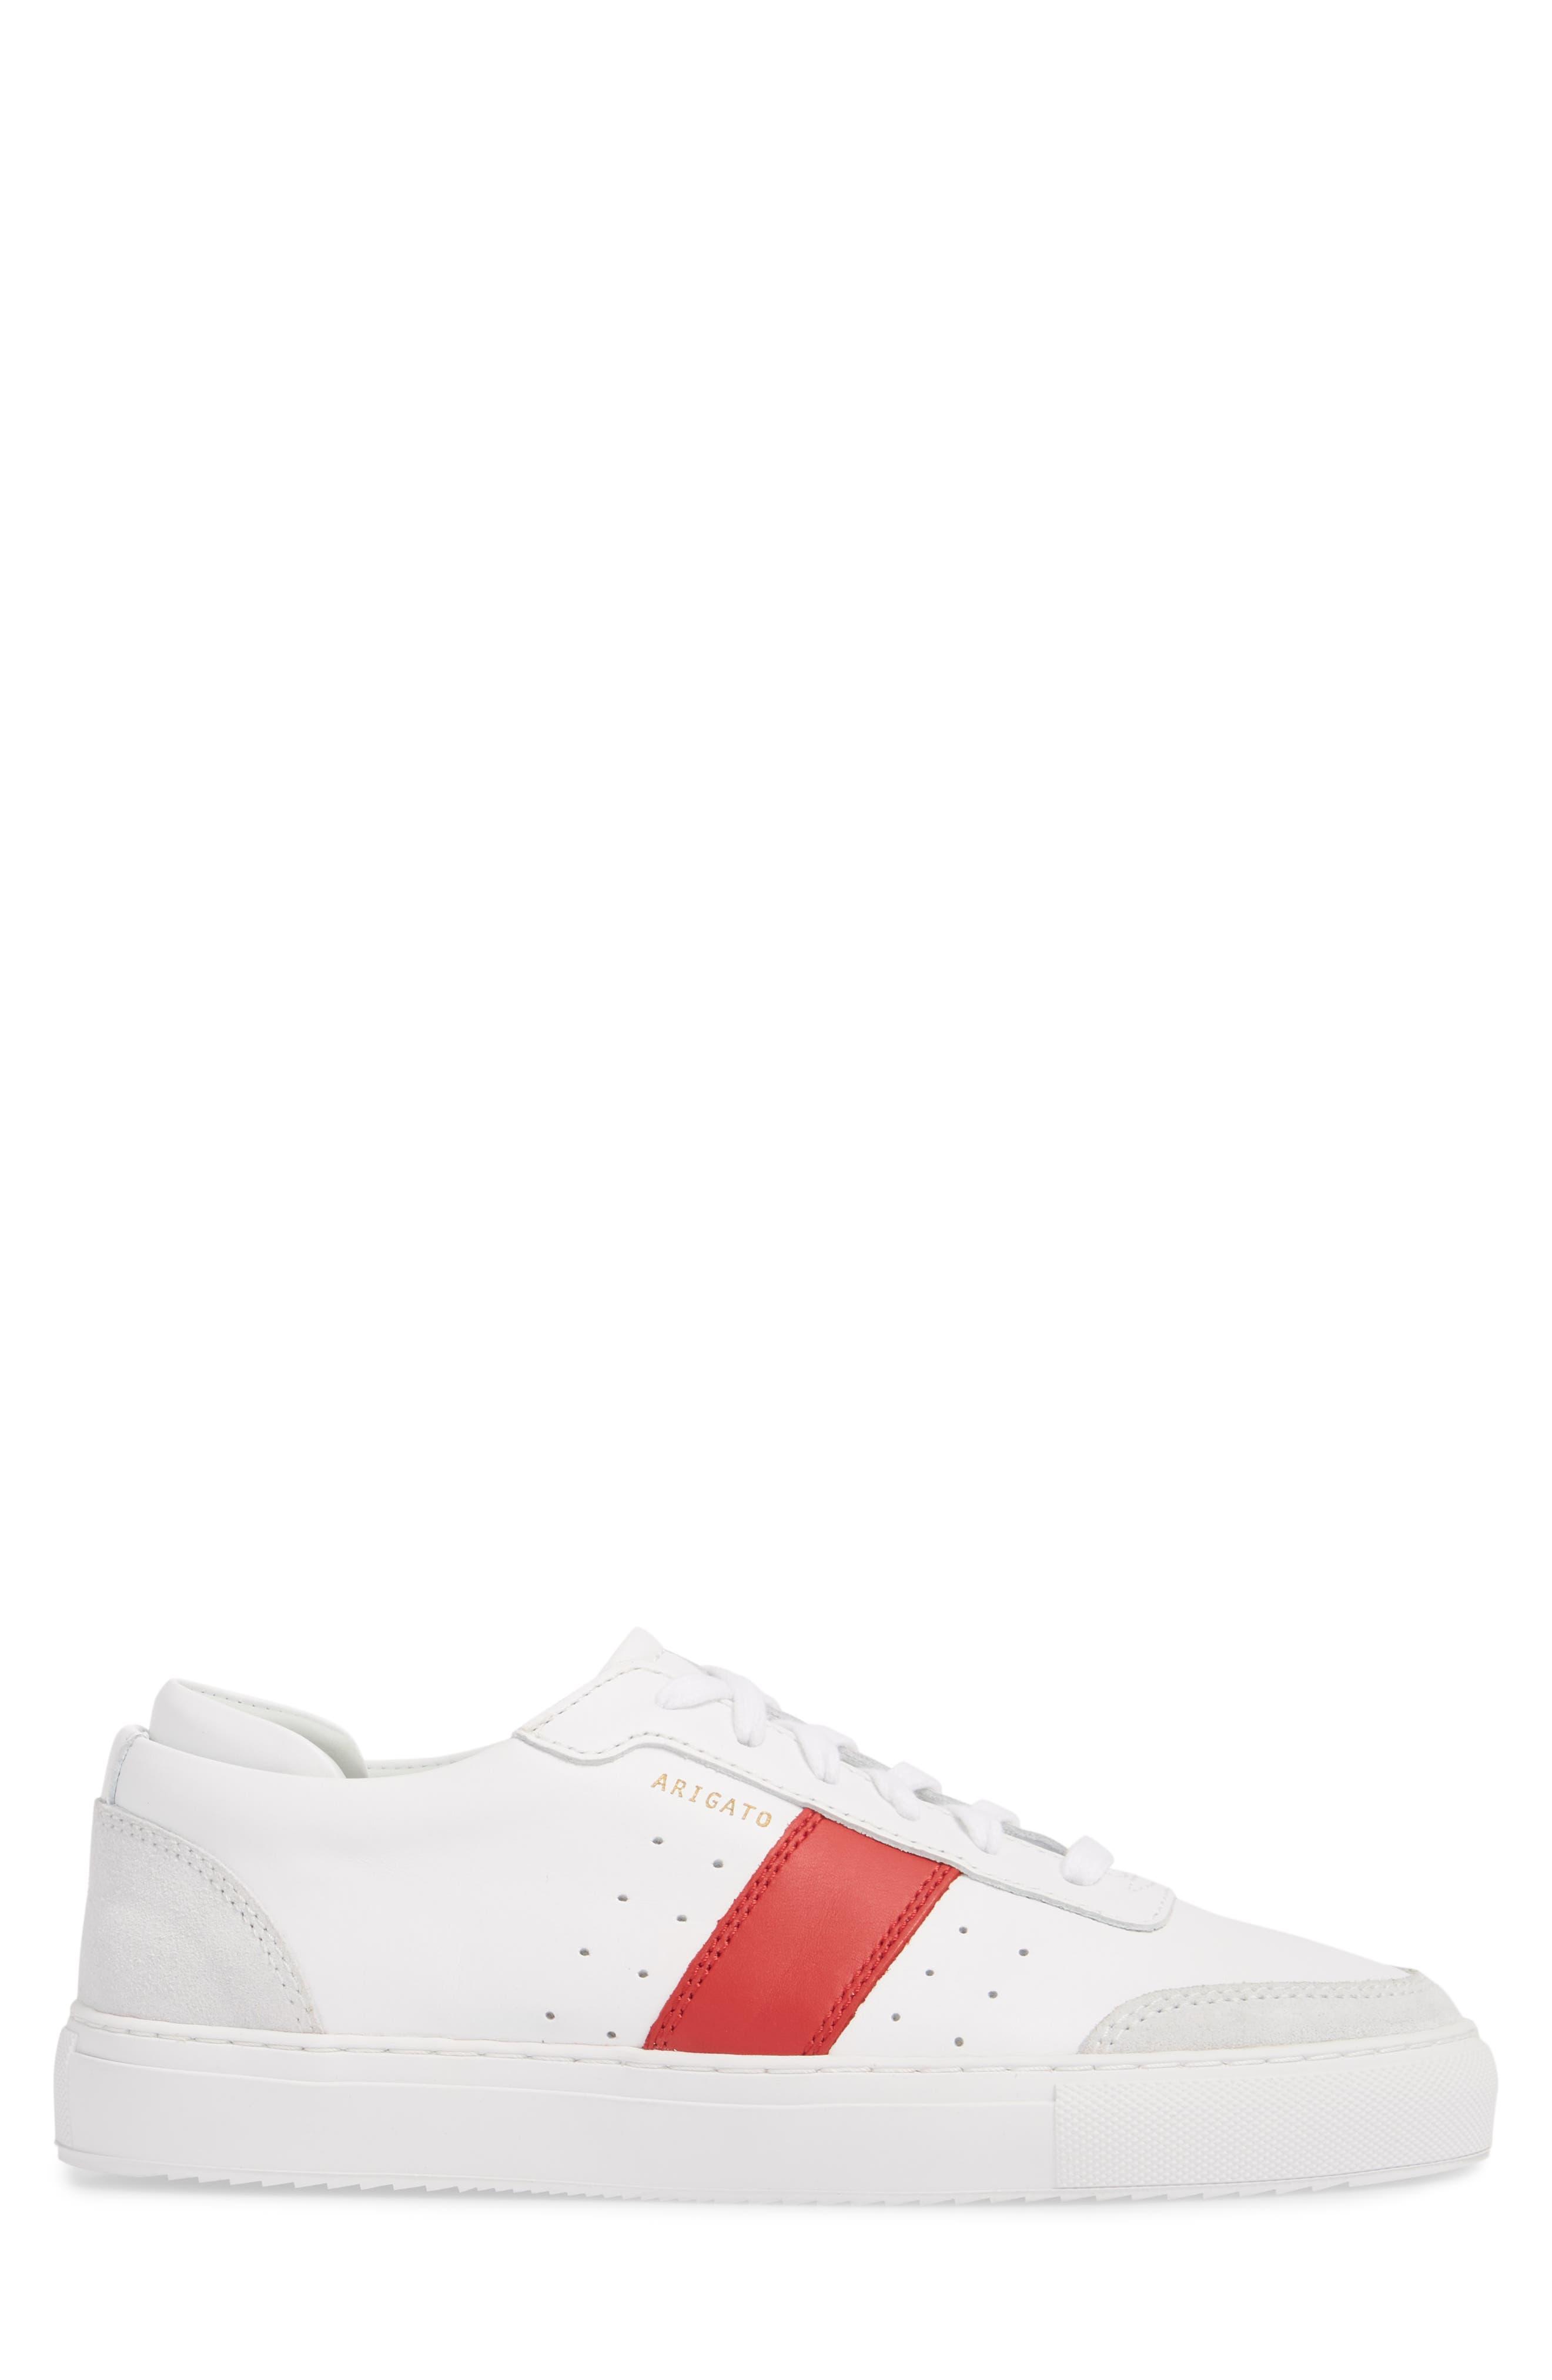 Dunk Striped Sneaker,                             Alternate thumbnail 3, color,